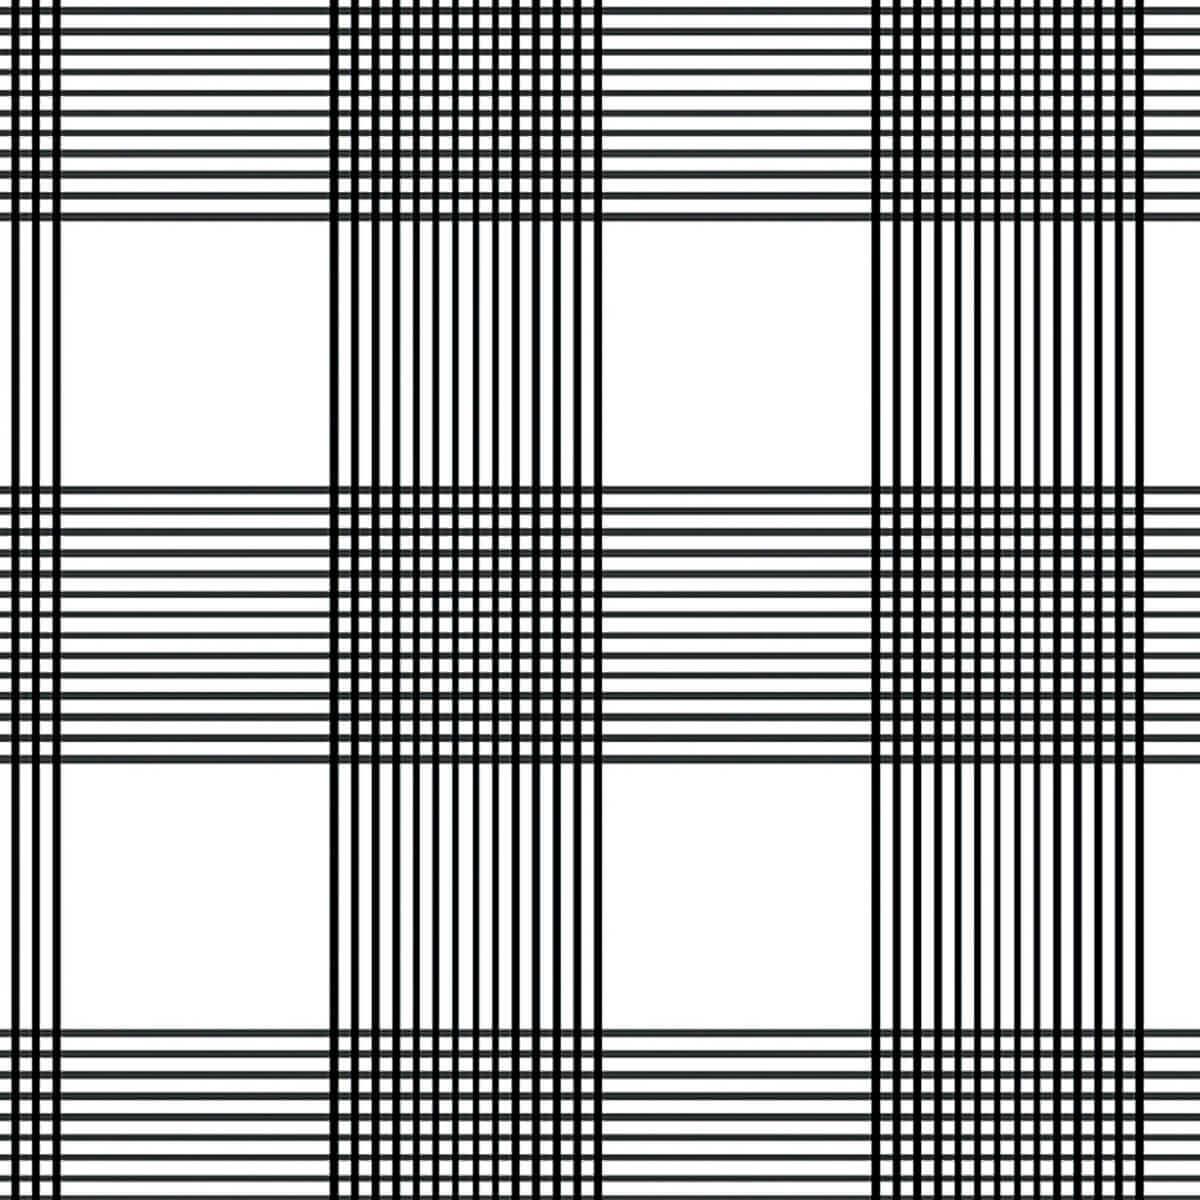 Papel de parede xadrez | Regina Strumpf